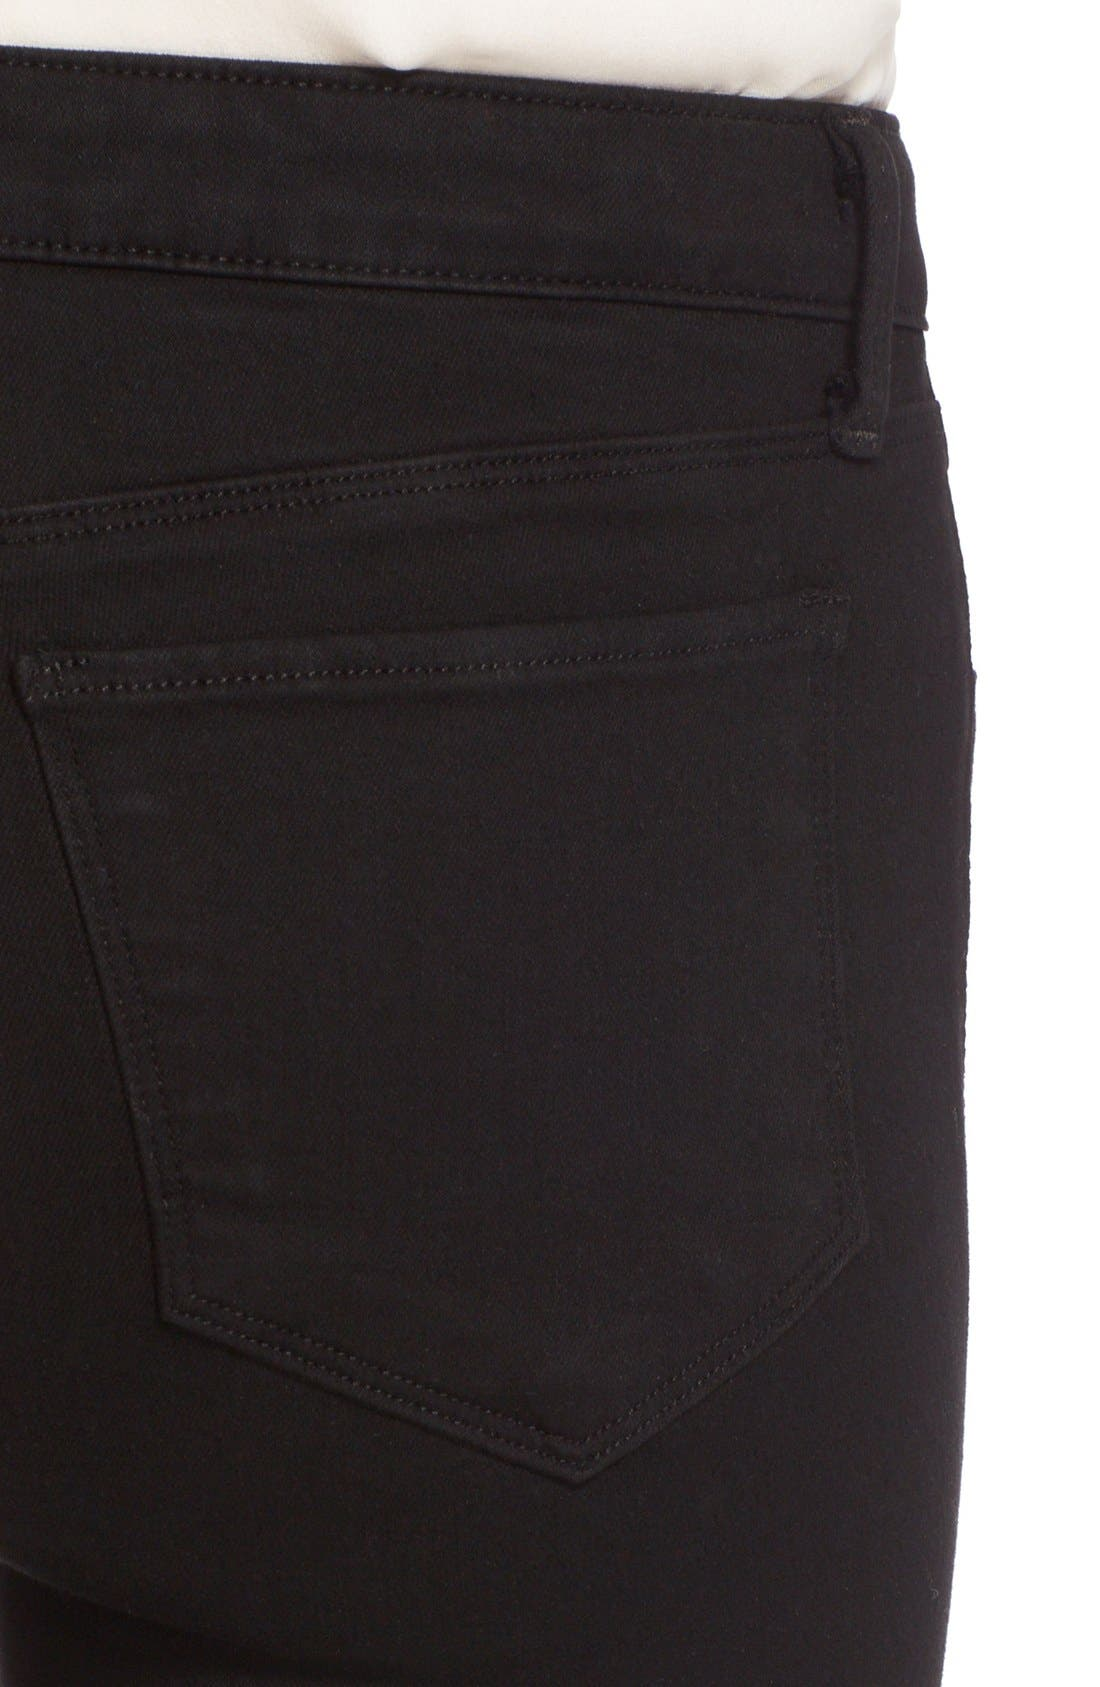 Marguerite Skinny Jeans,                             Alternate thumbnail 5, color,                             001